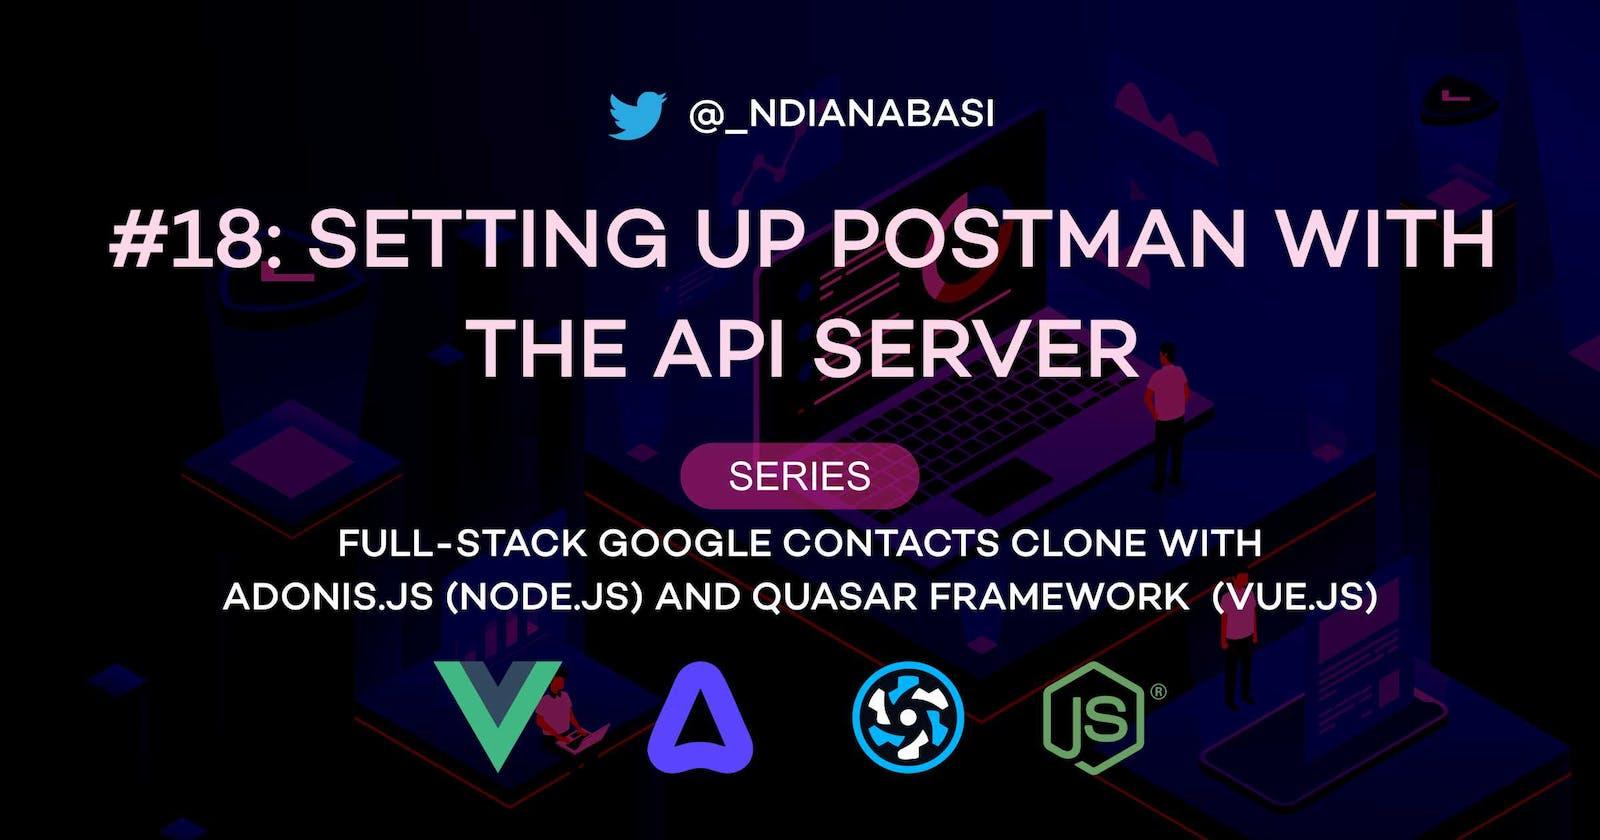 Setting Up Postman with the API Server | Full-Stack Google Contacts Clone with AdonisJS (Node.js) and Quasar Framework (Vue.js)